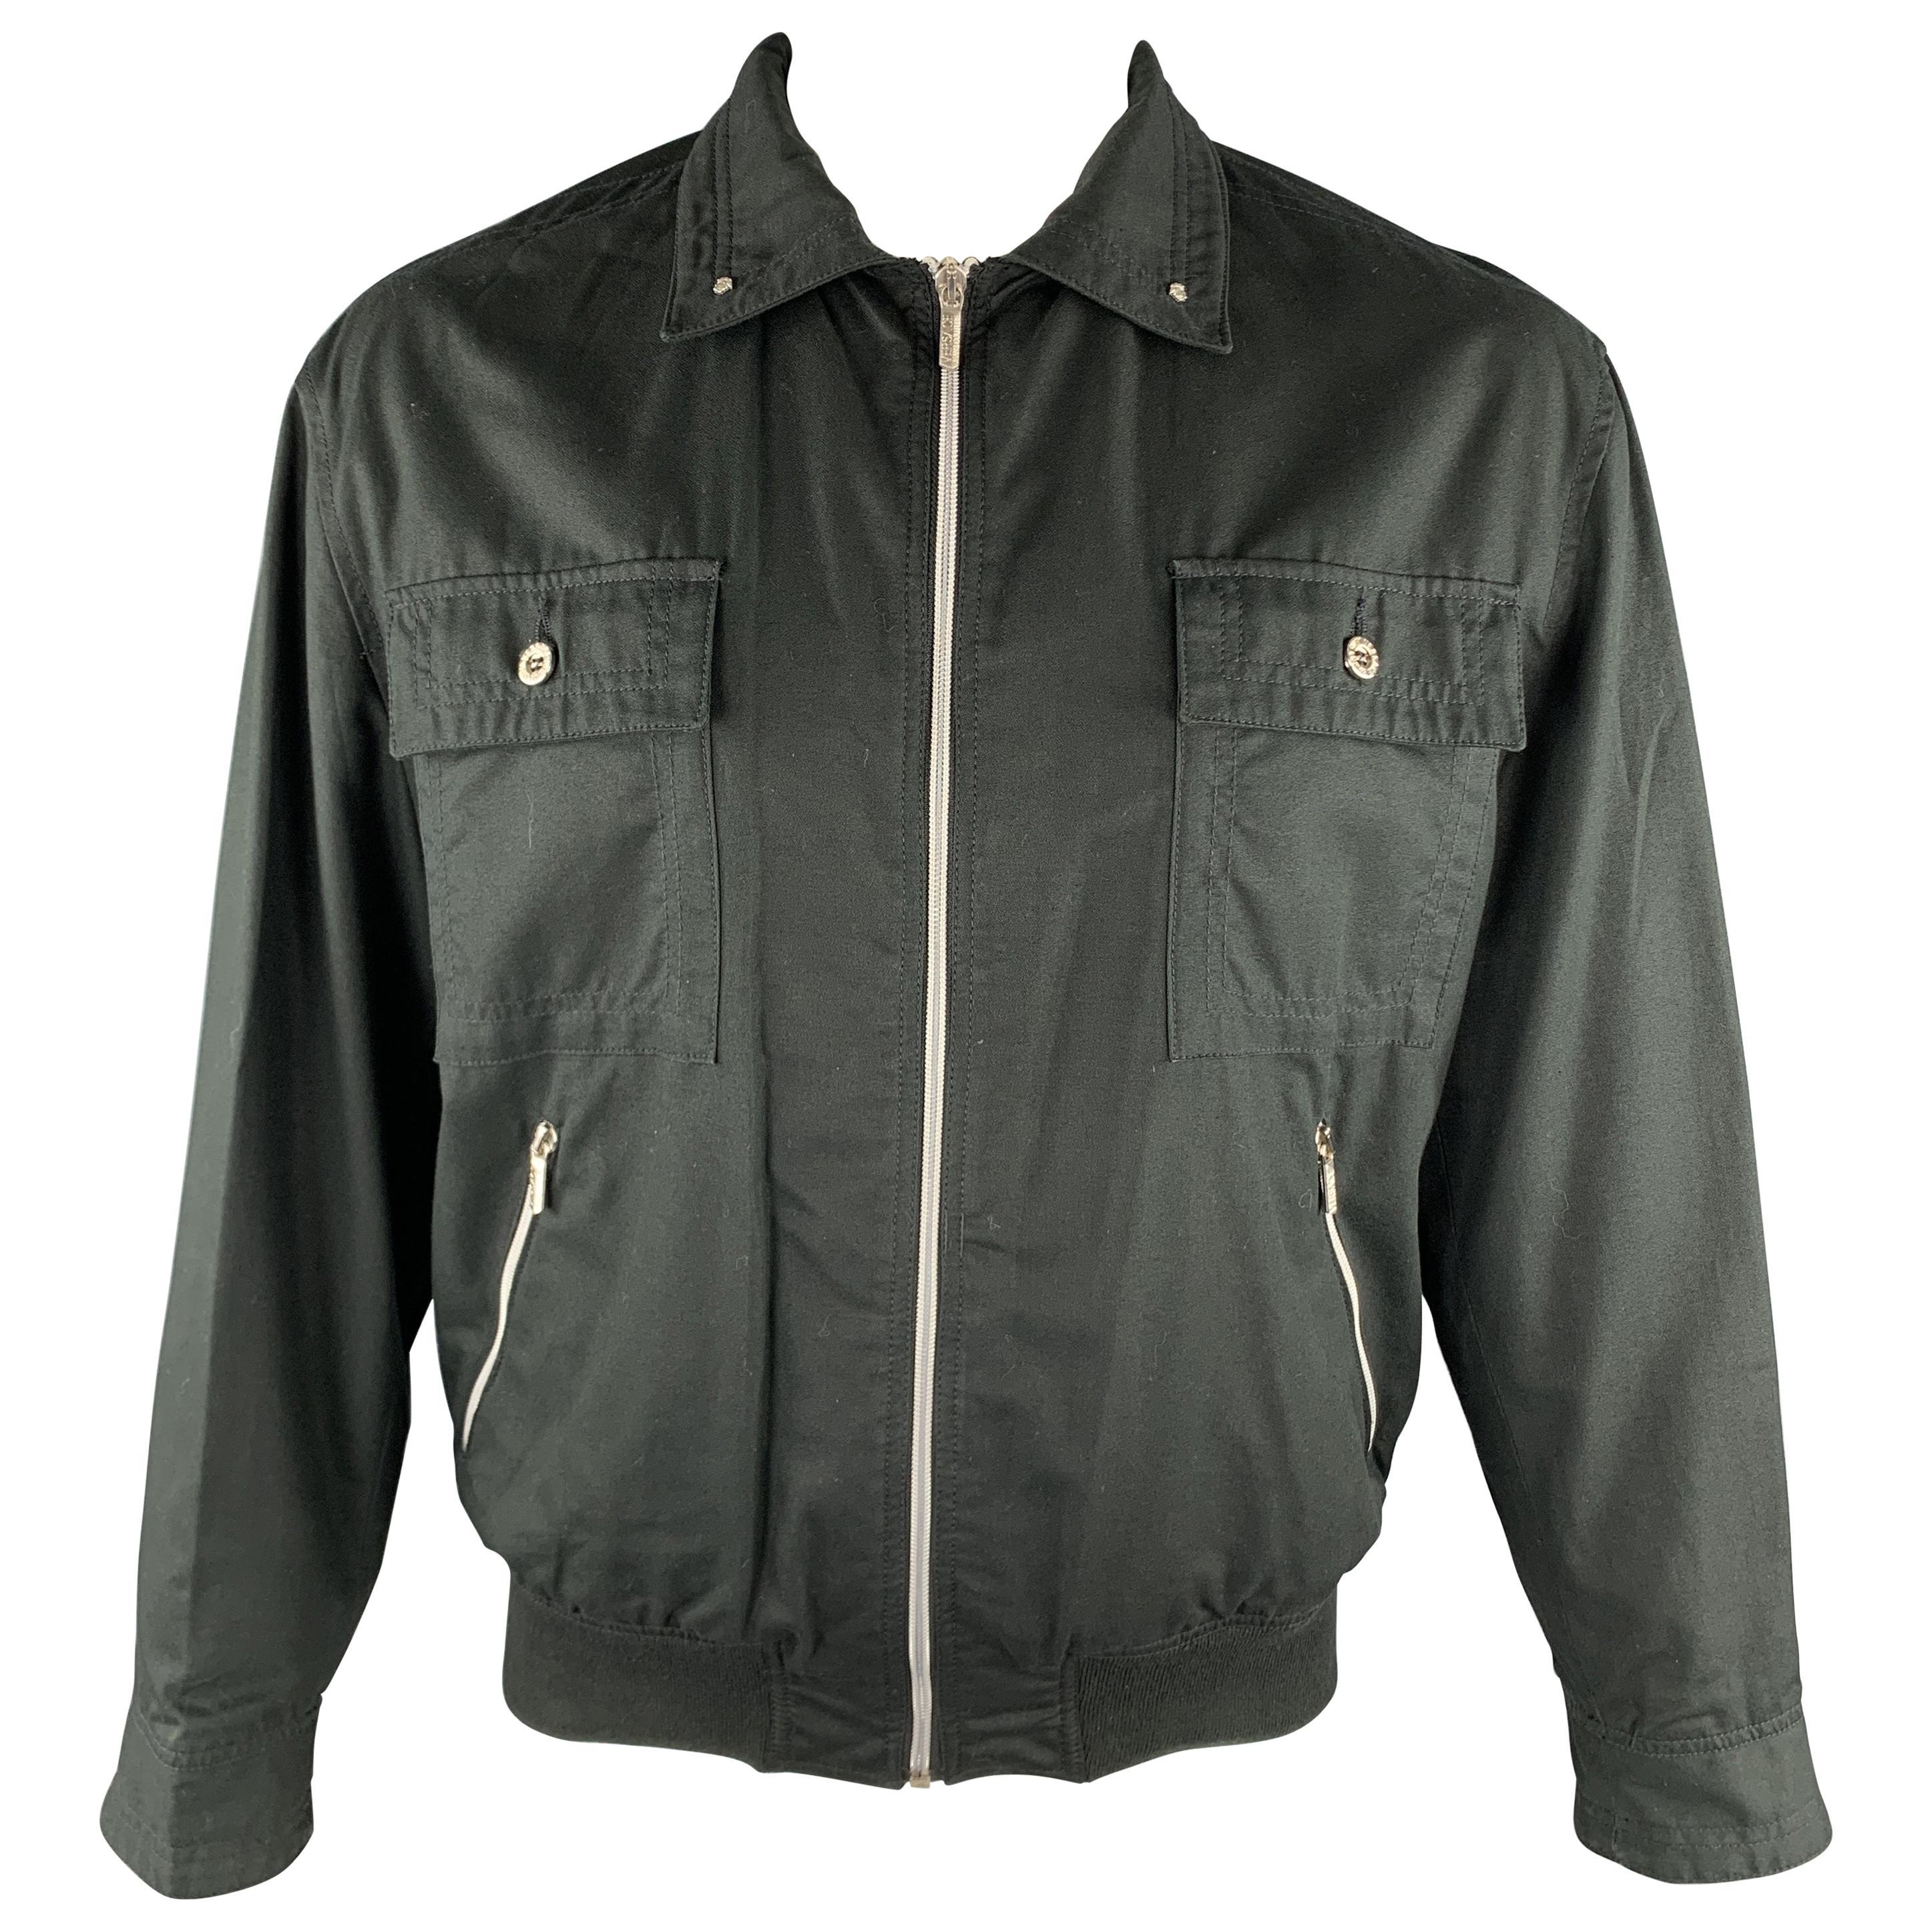 Vintage VERSACE JEANS COUTURE Size M Black Cotton Full Zip Silver Buttons Jacket